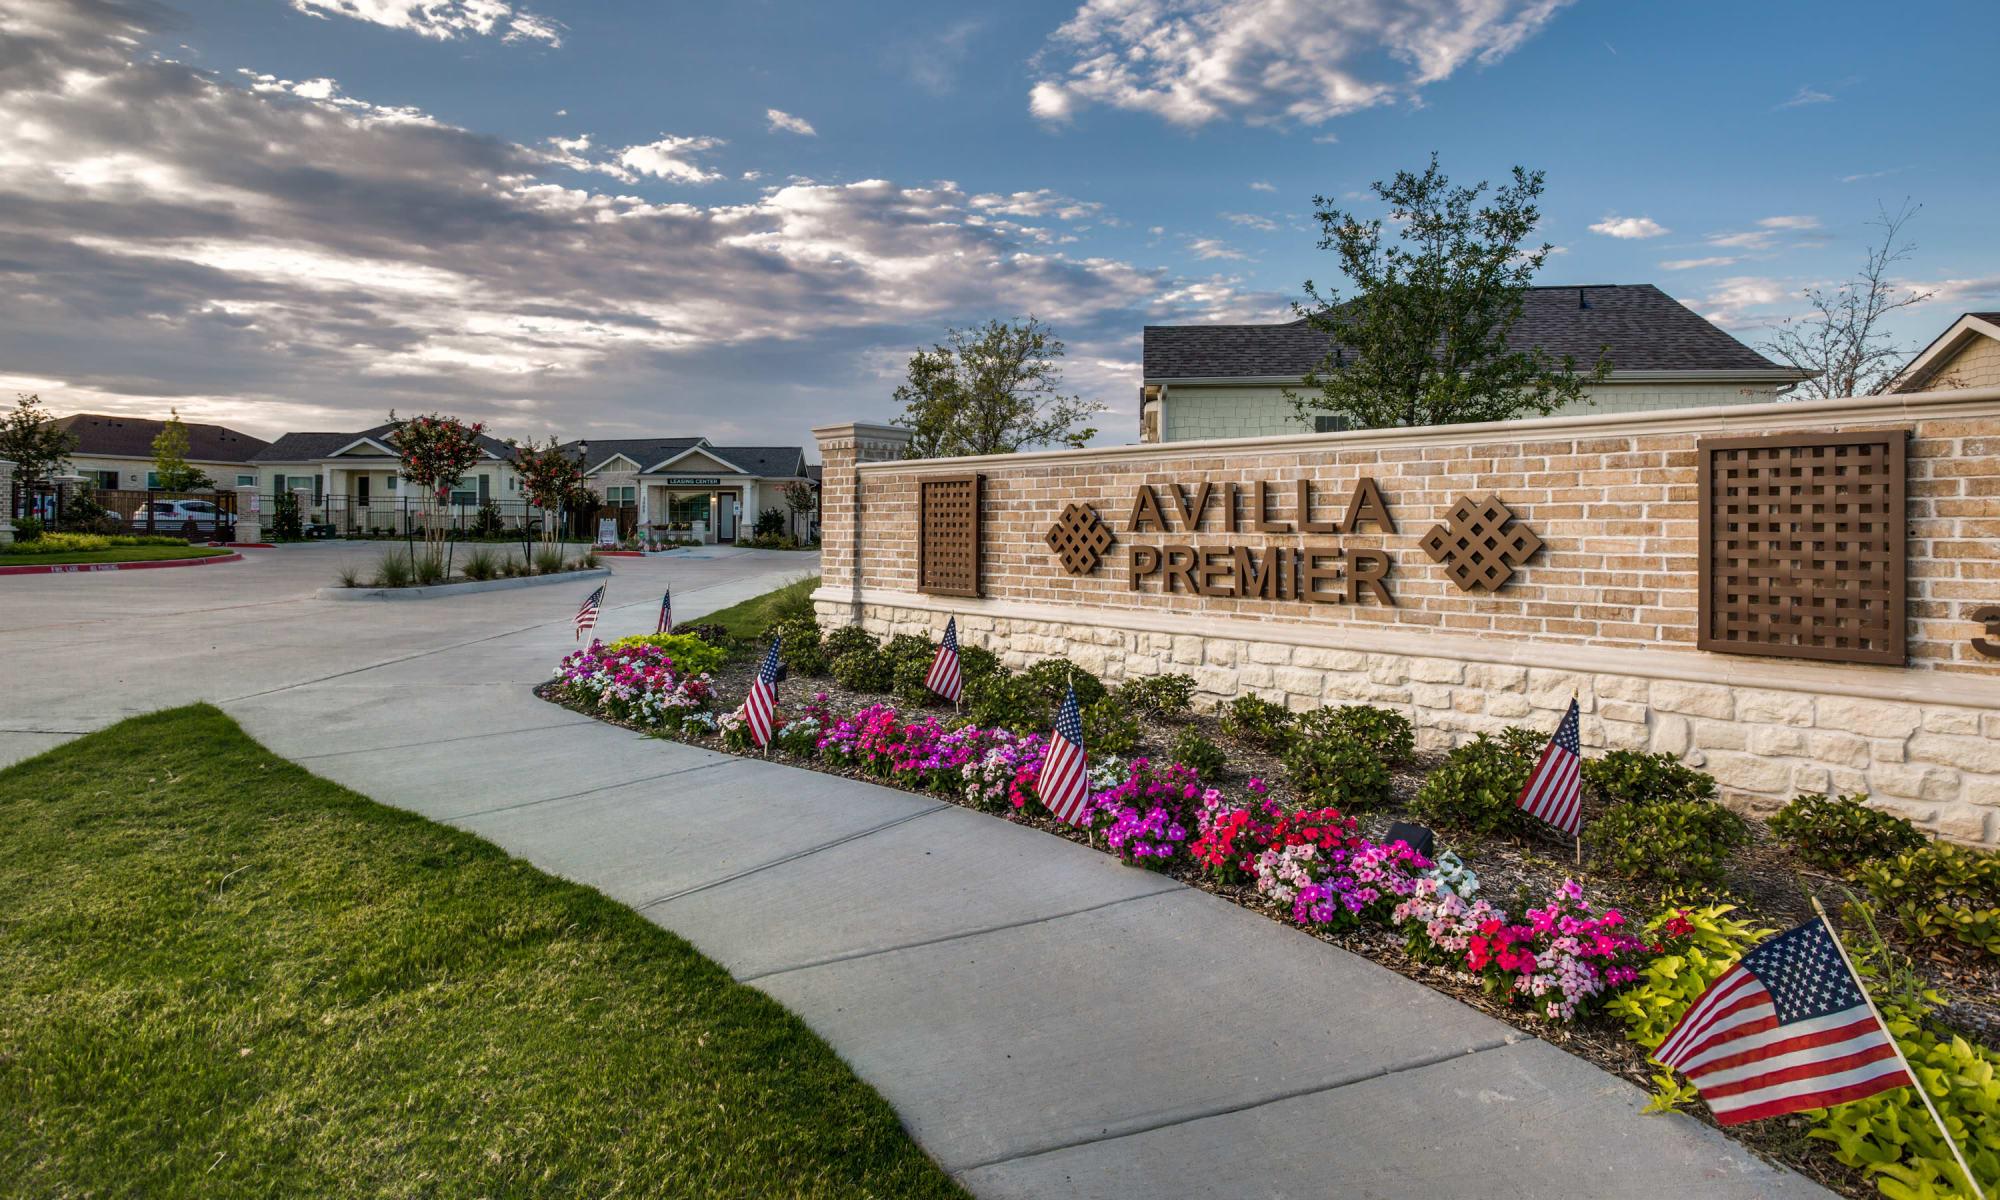 Avilla Premier apartments in Plano, Texas